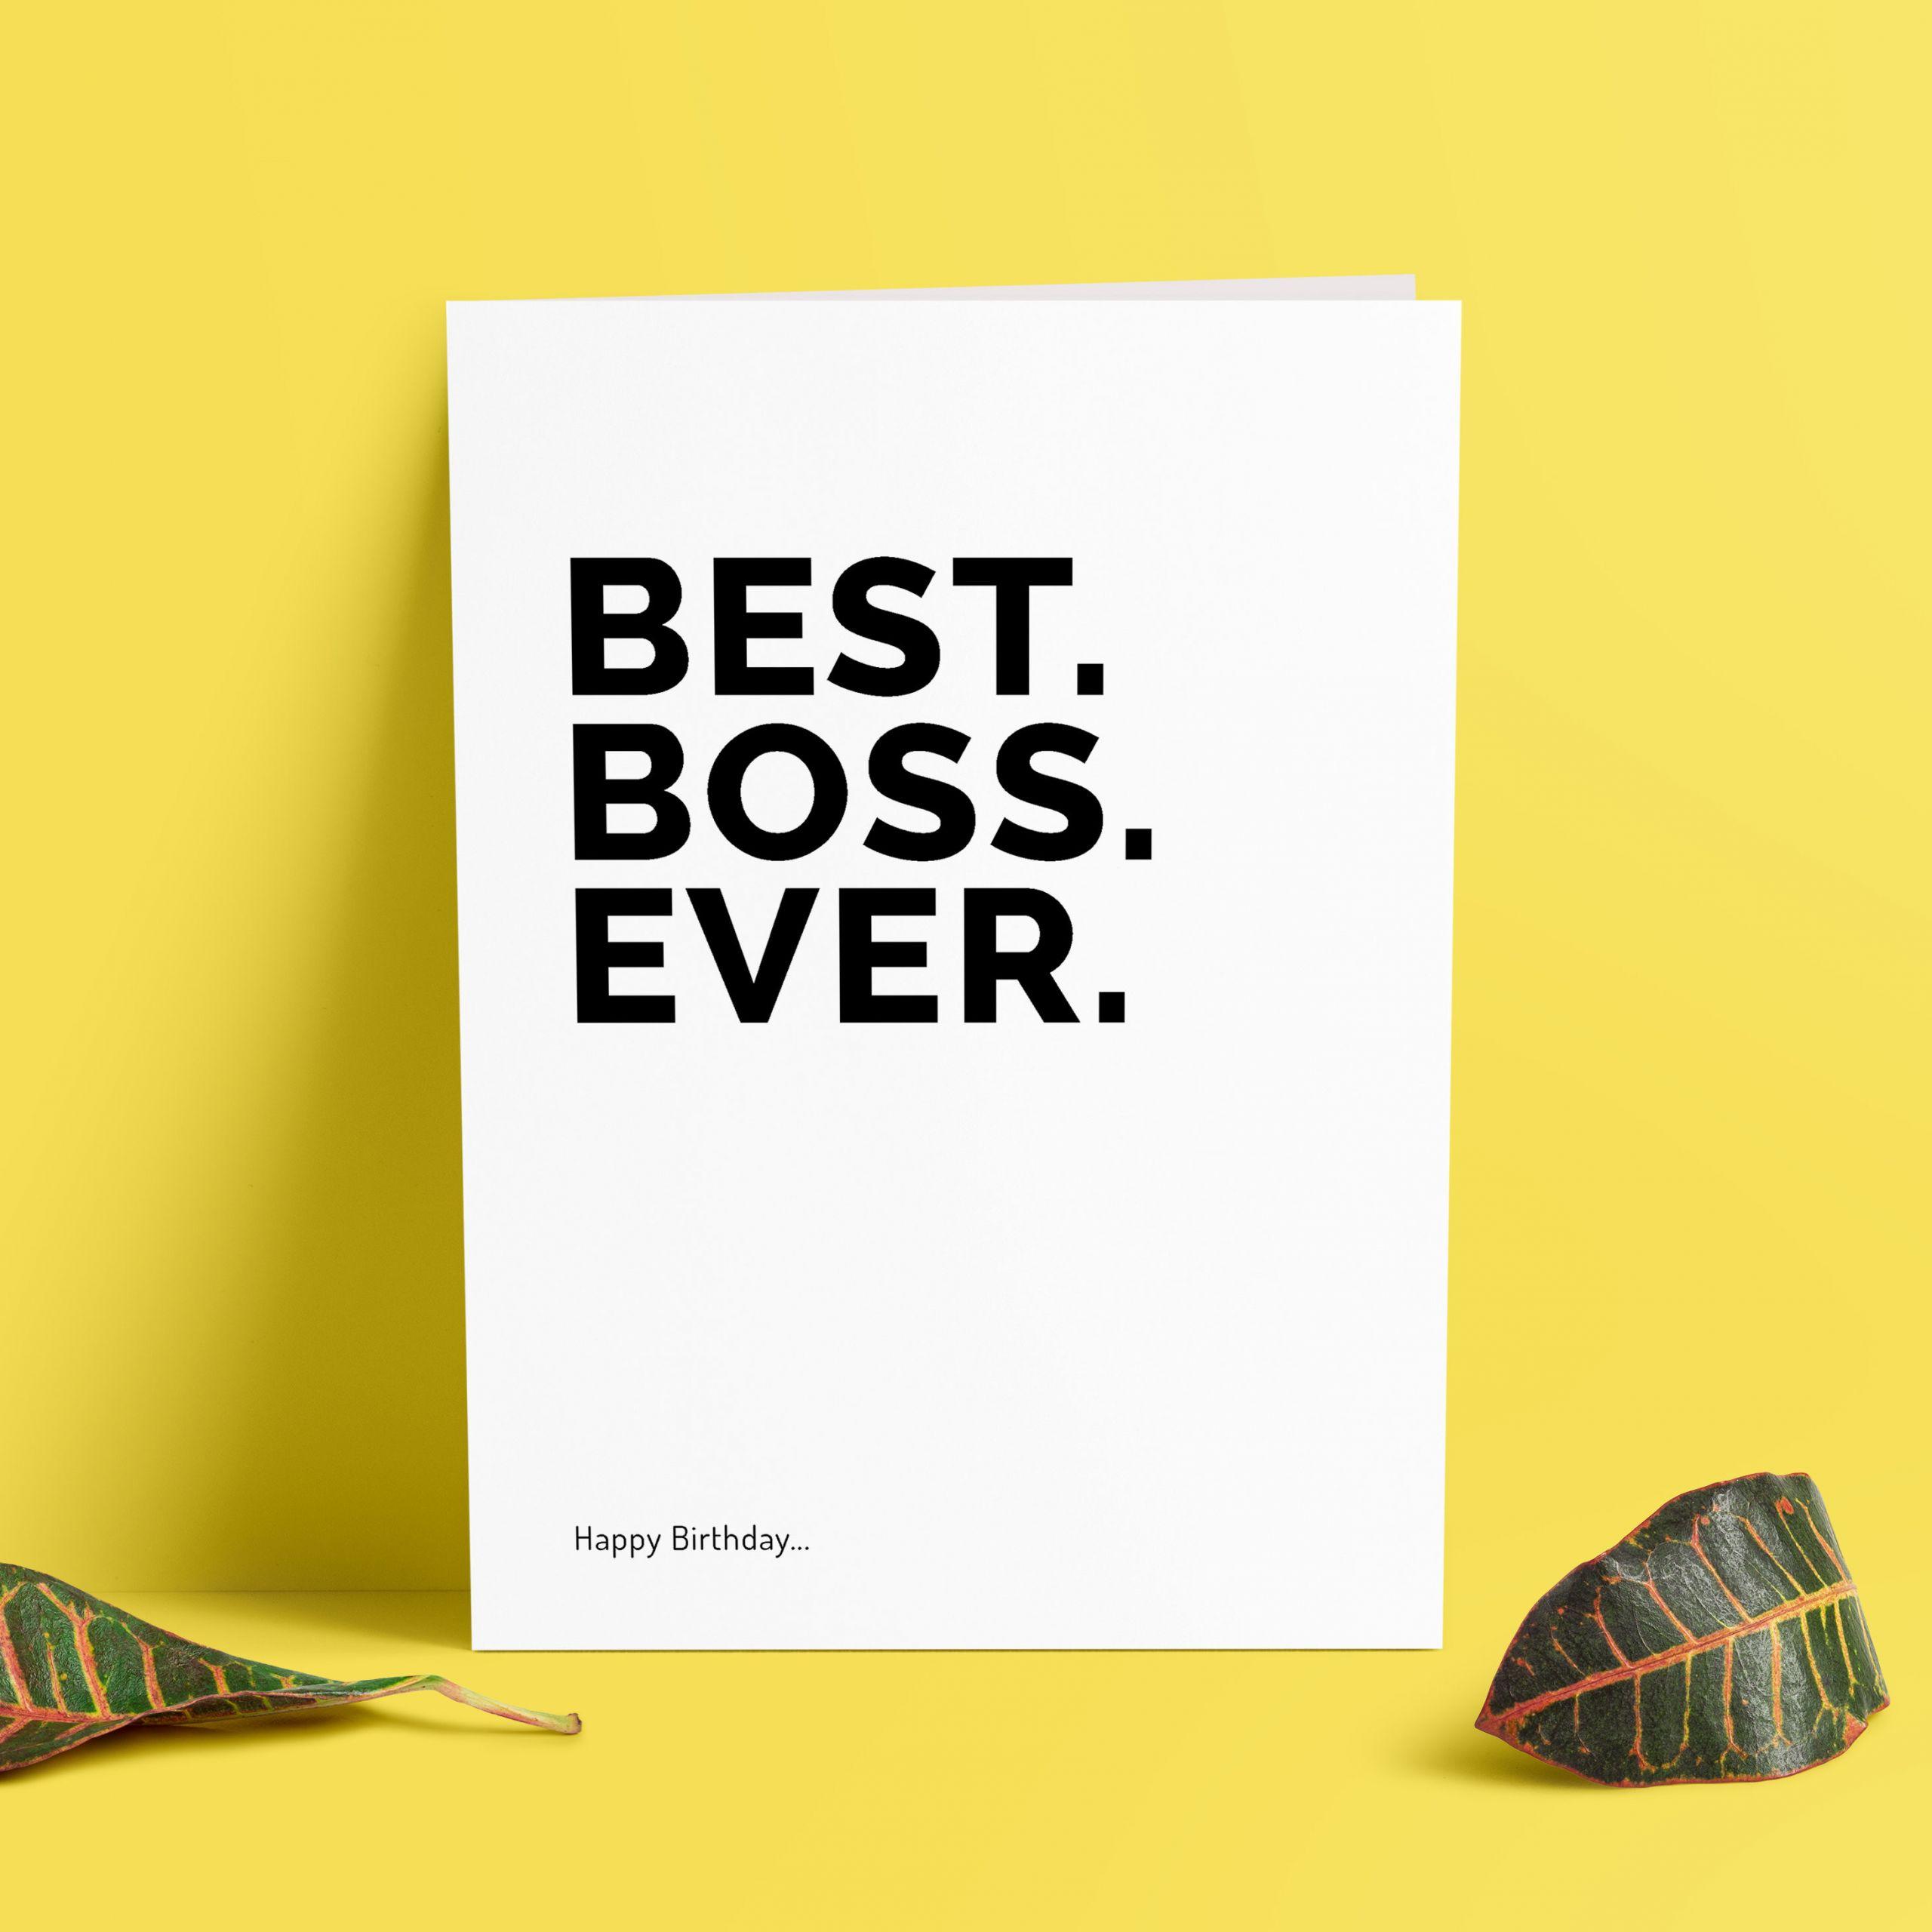 Funny Boss Birthday Cards  Funny Boss Birthday Cards Best Boss Ever Boss Birthday